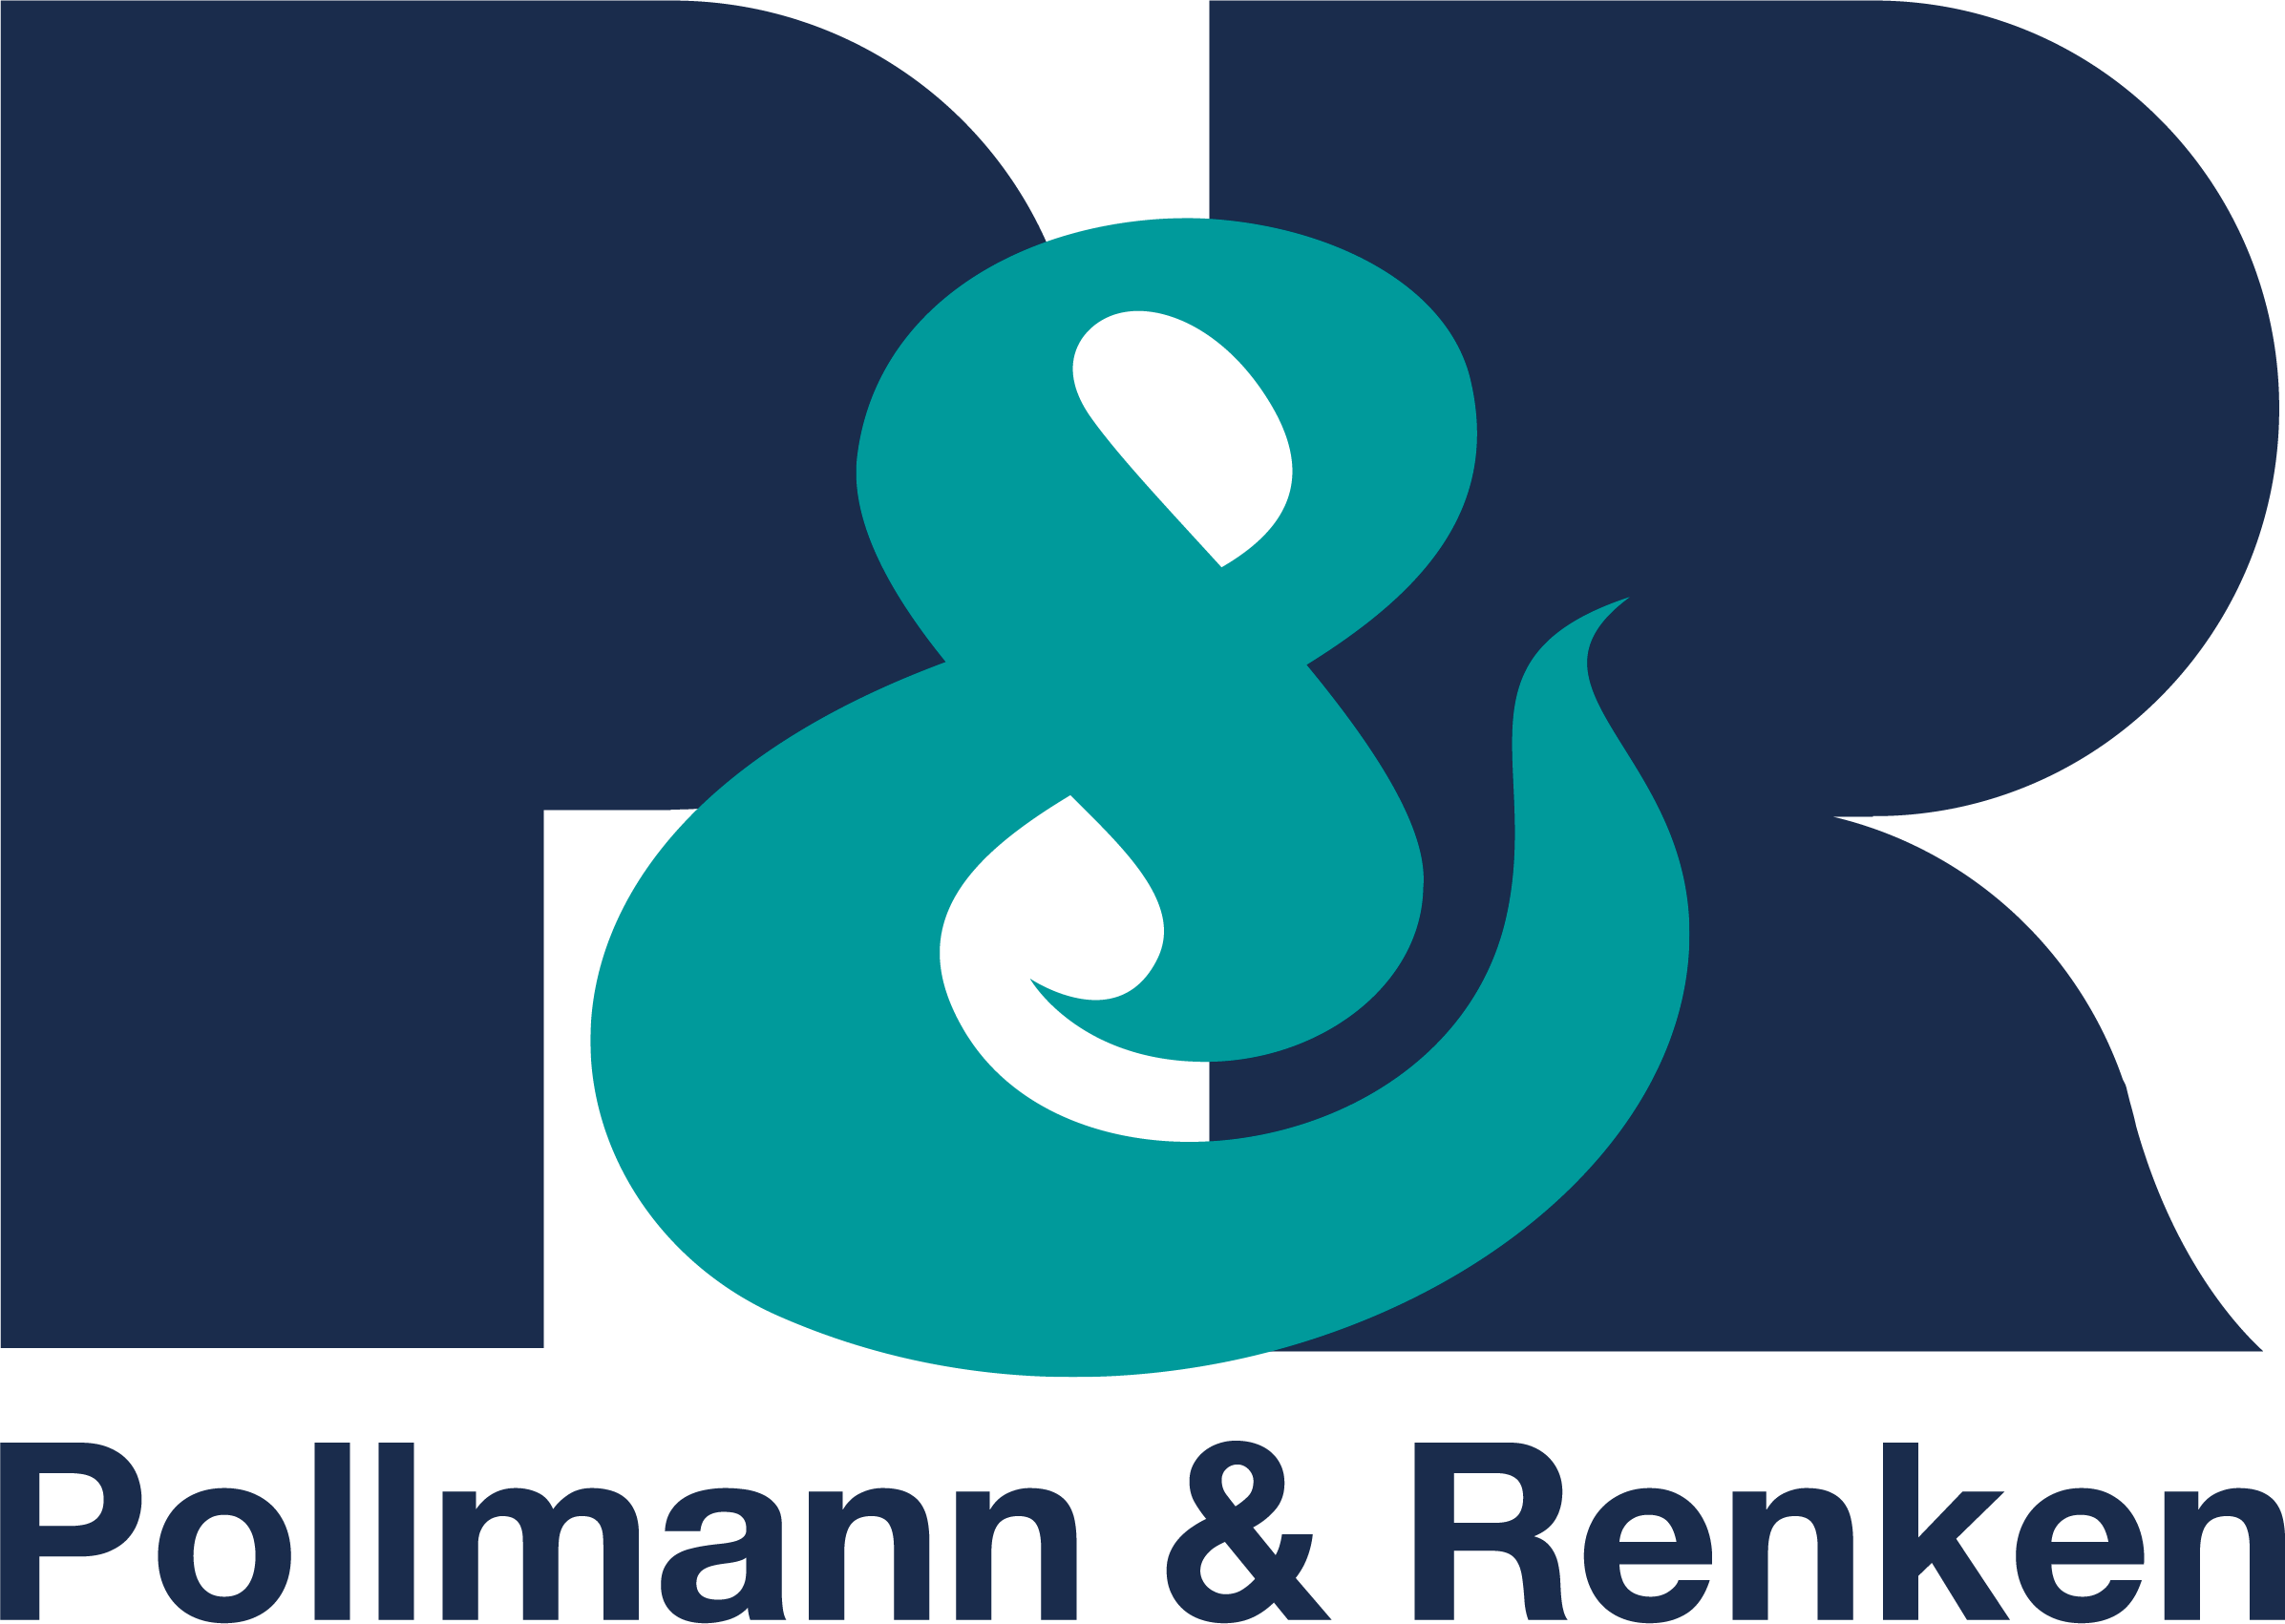 Pollmann & Renken GmbH